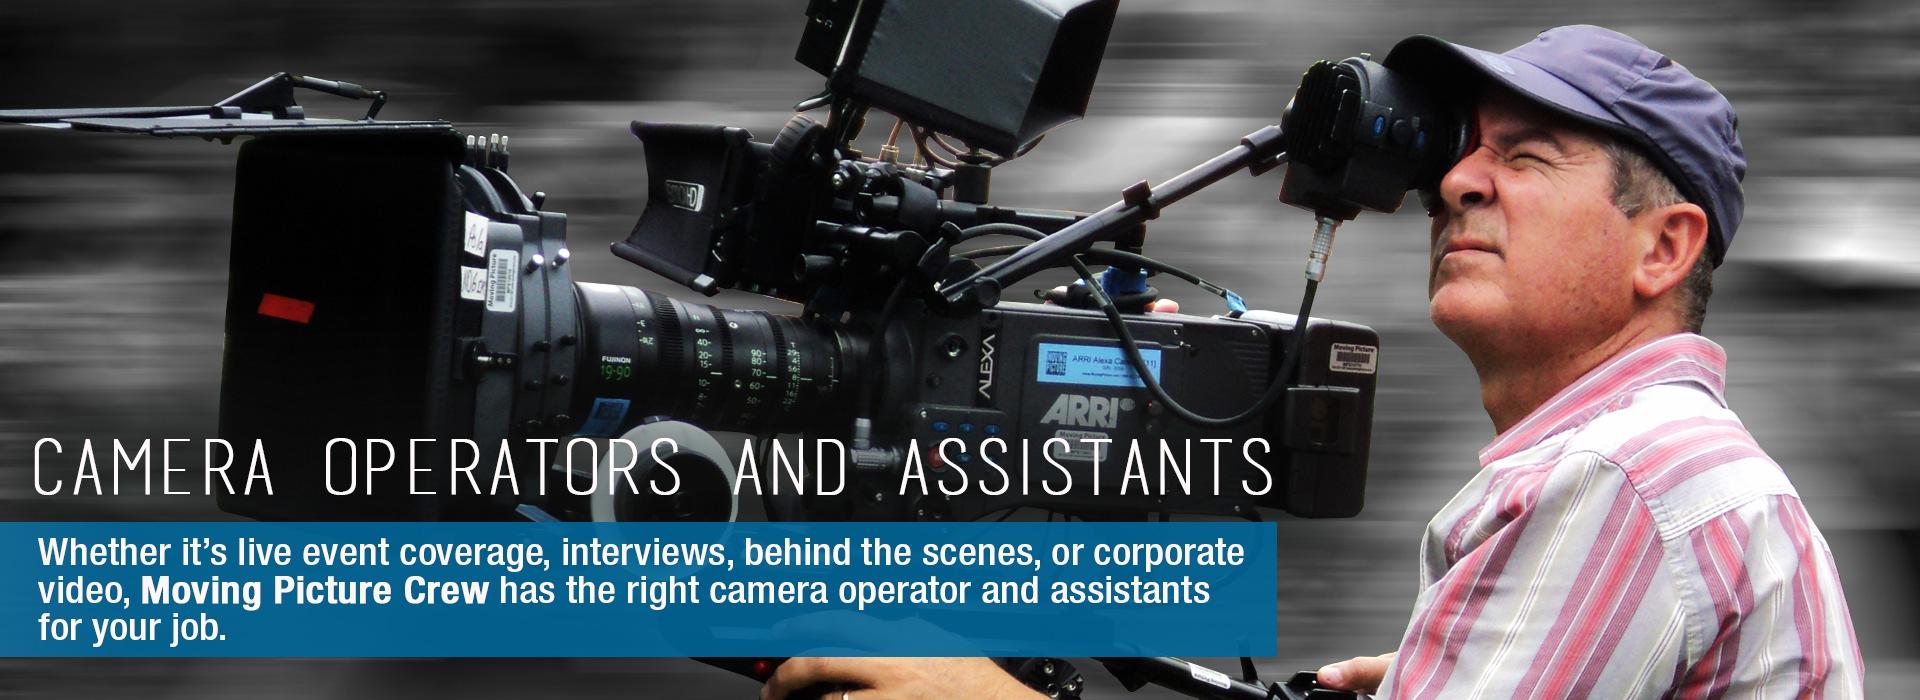 MPCrew-Banner-CameraOperator